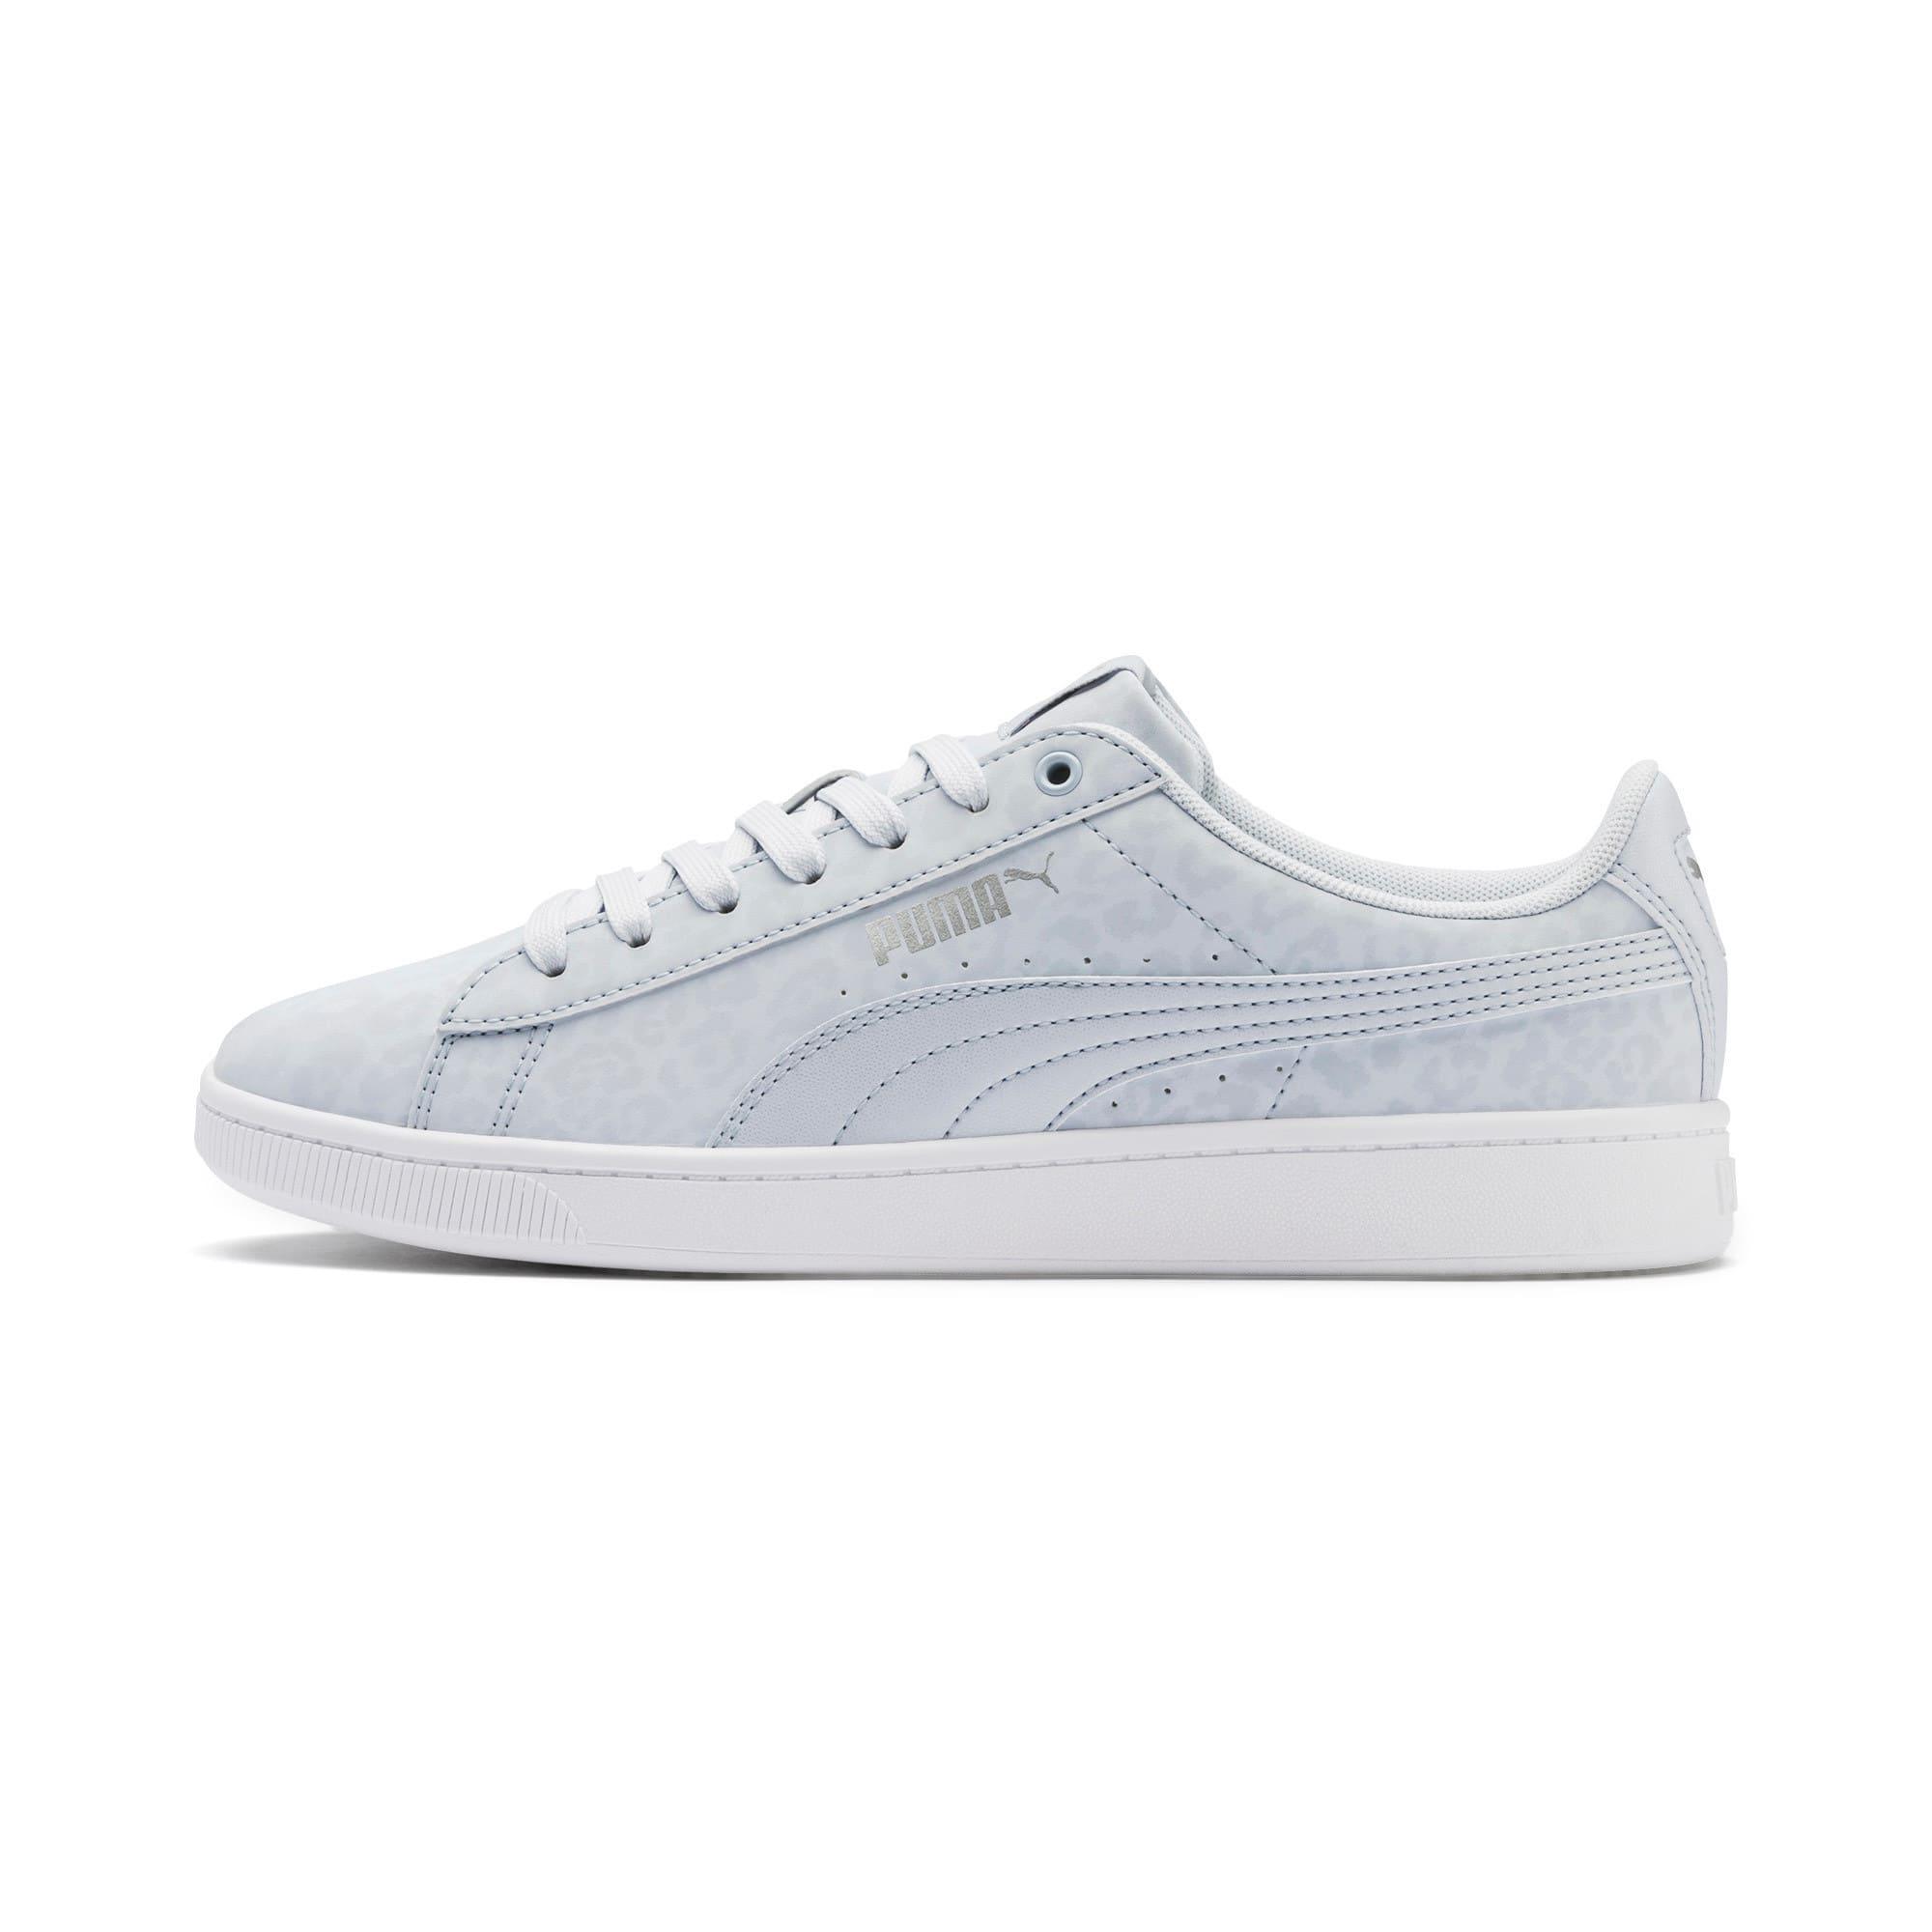 Thumbnail 1 of PUMA Vikky v2 Wildcat Women's Sneakers, Heather-Puma Silver-White, medium